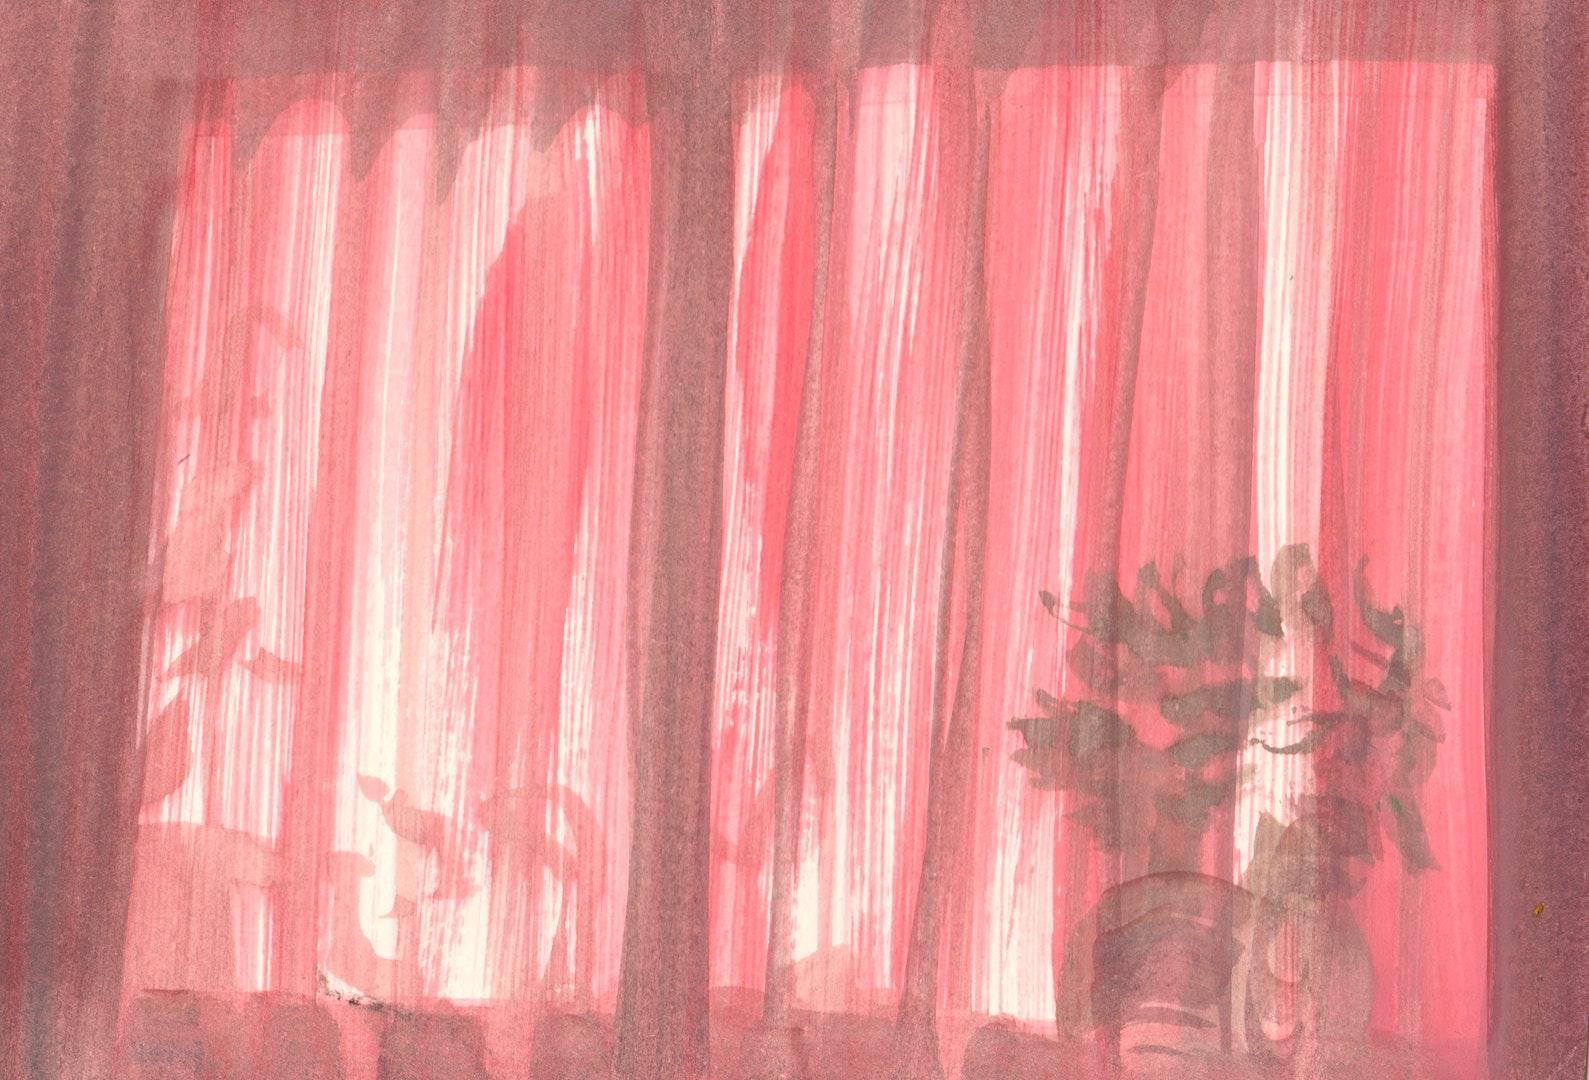 'Xinzi Song, Qinhangdao, China', Catherine Knight, Gouache on watercolour paper, 14 x 21 cm